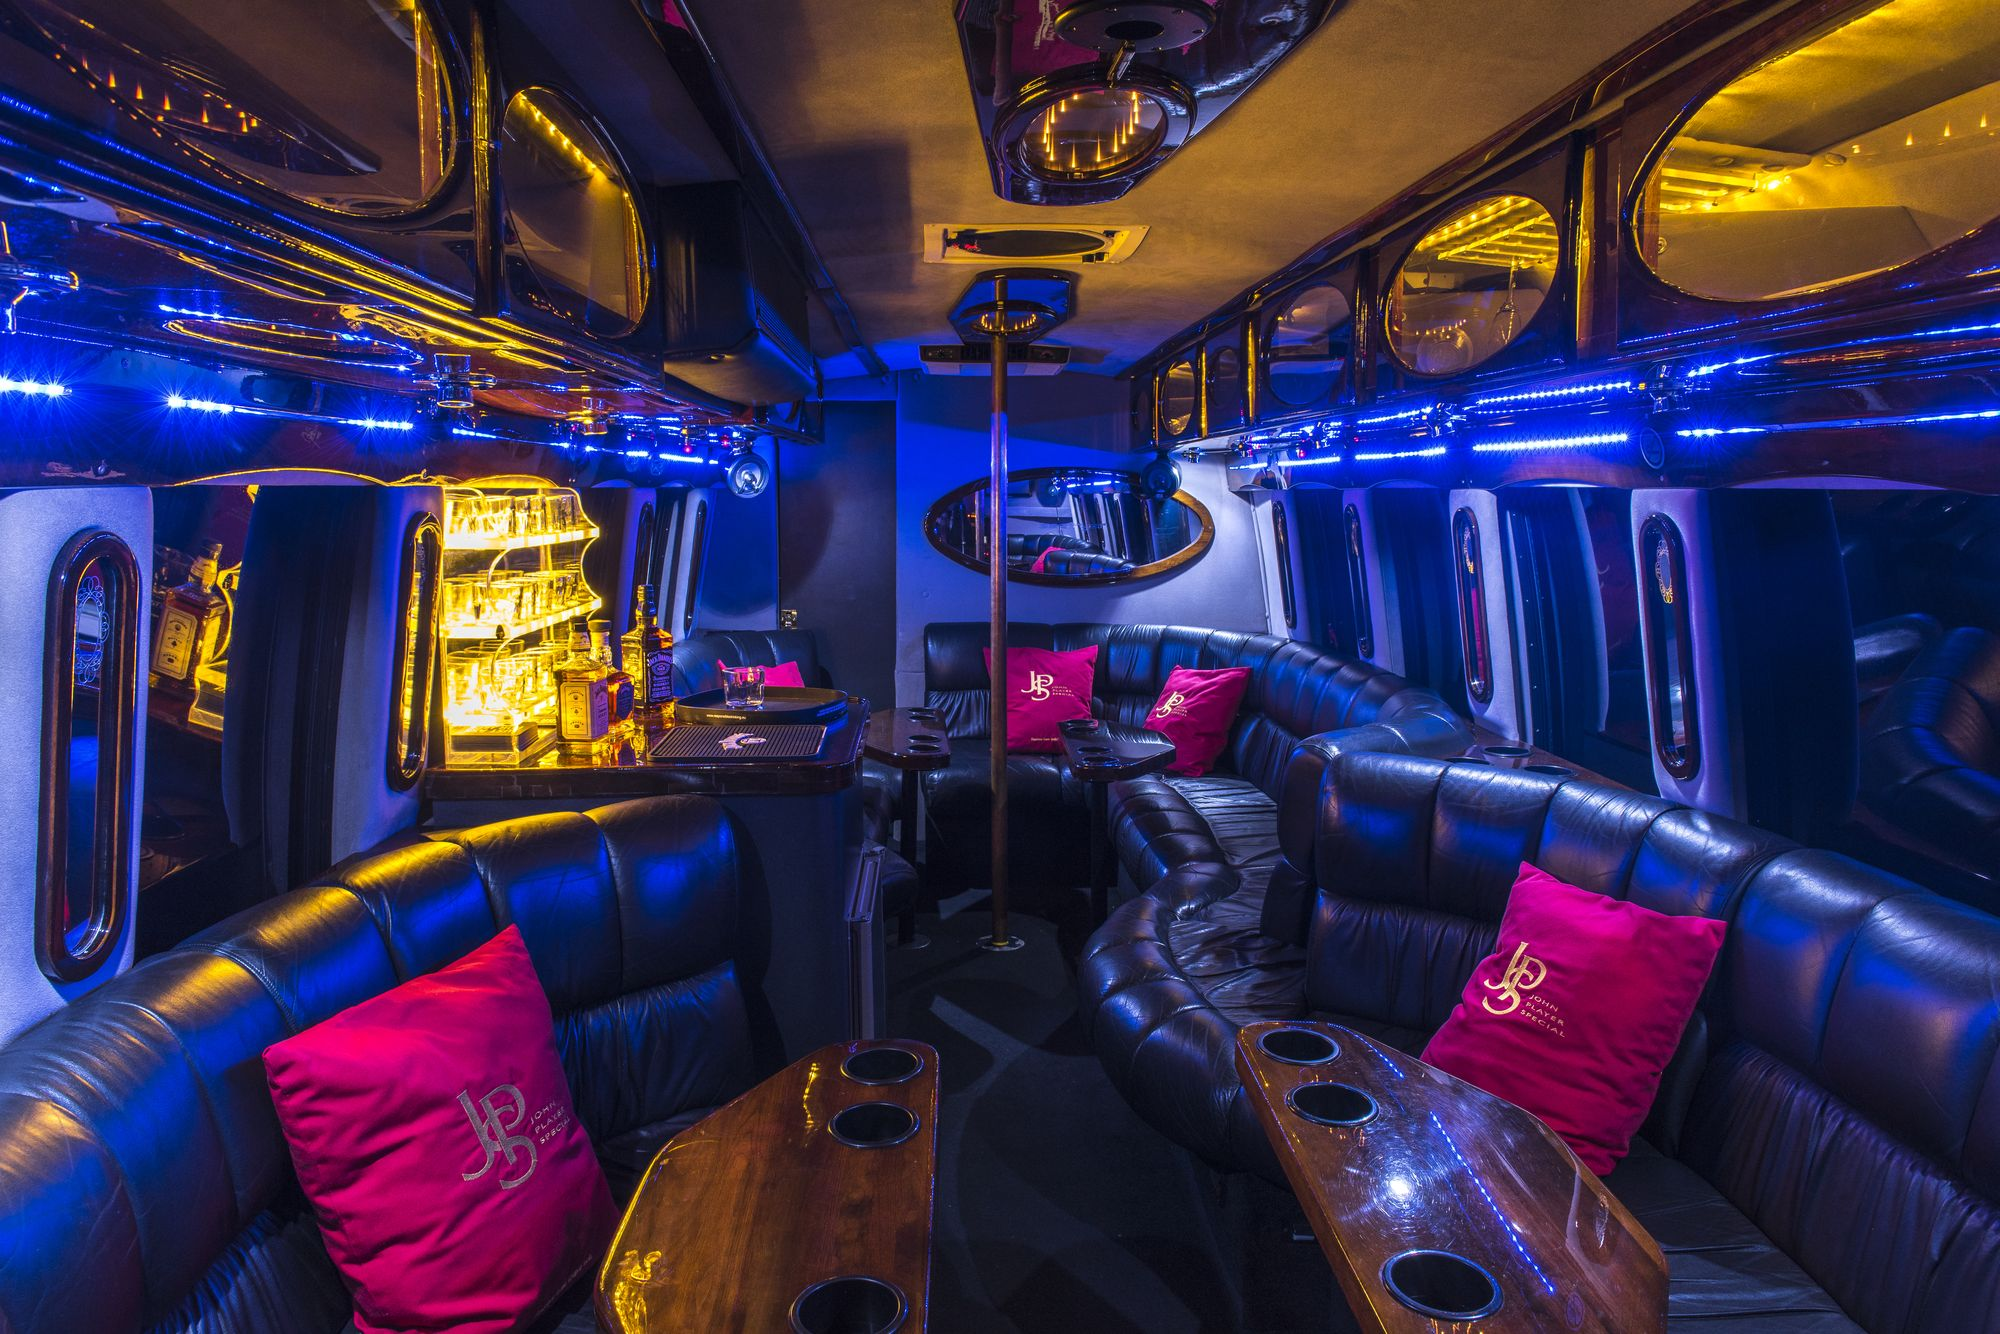 Partybus Frankfurt